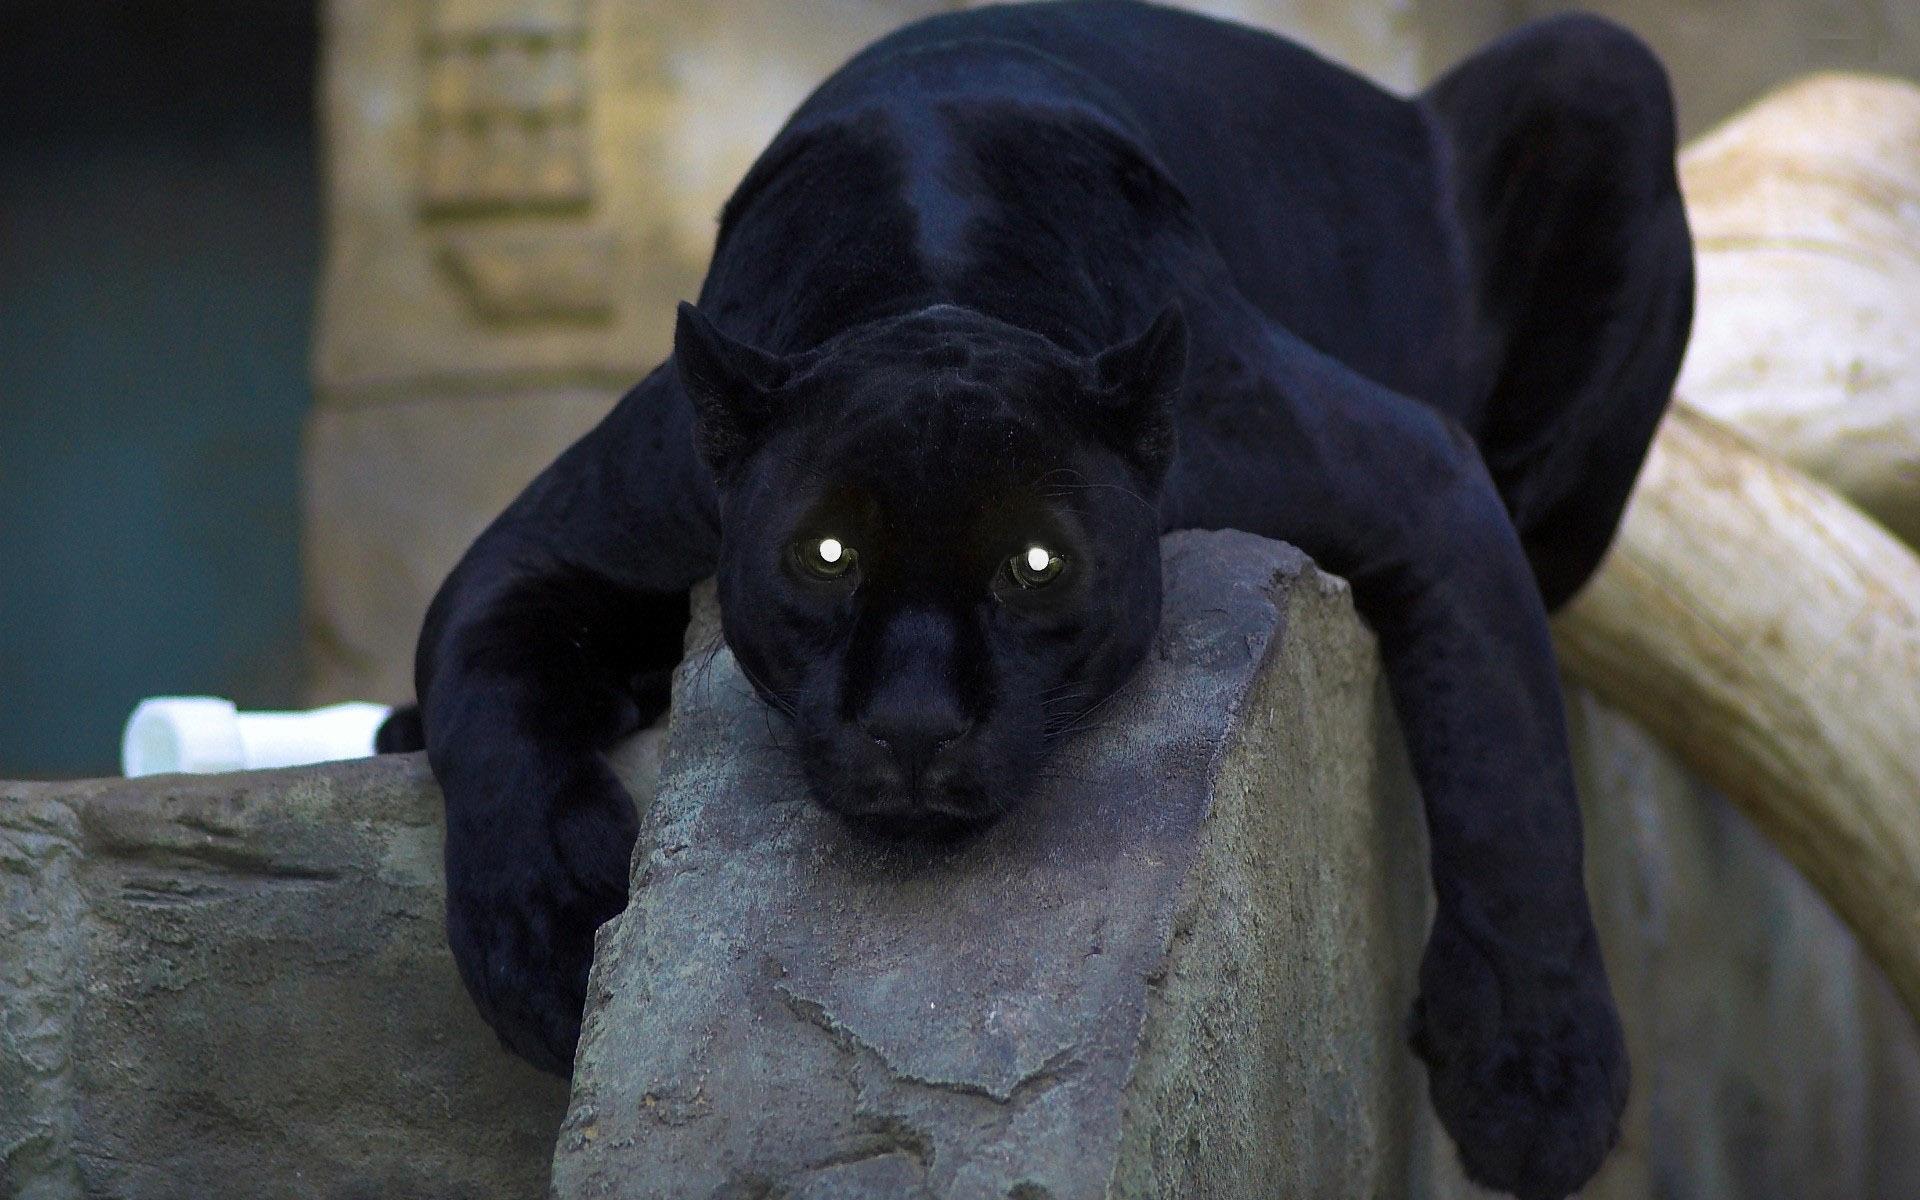 black panther background image black panther 3d black panther amazing 1920x1200